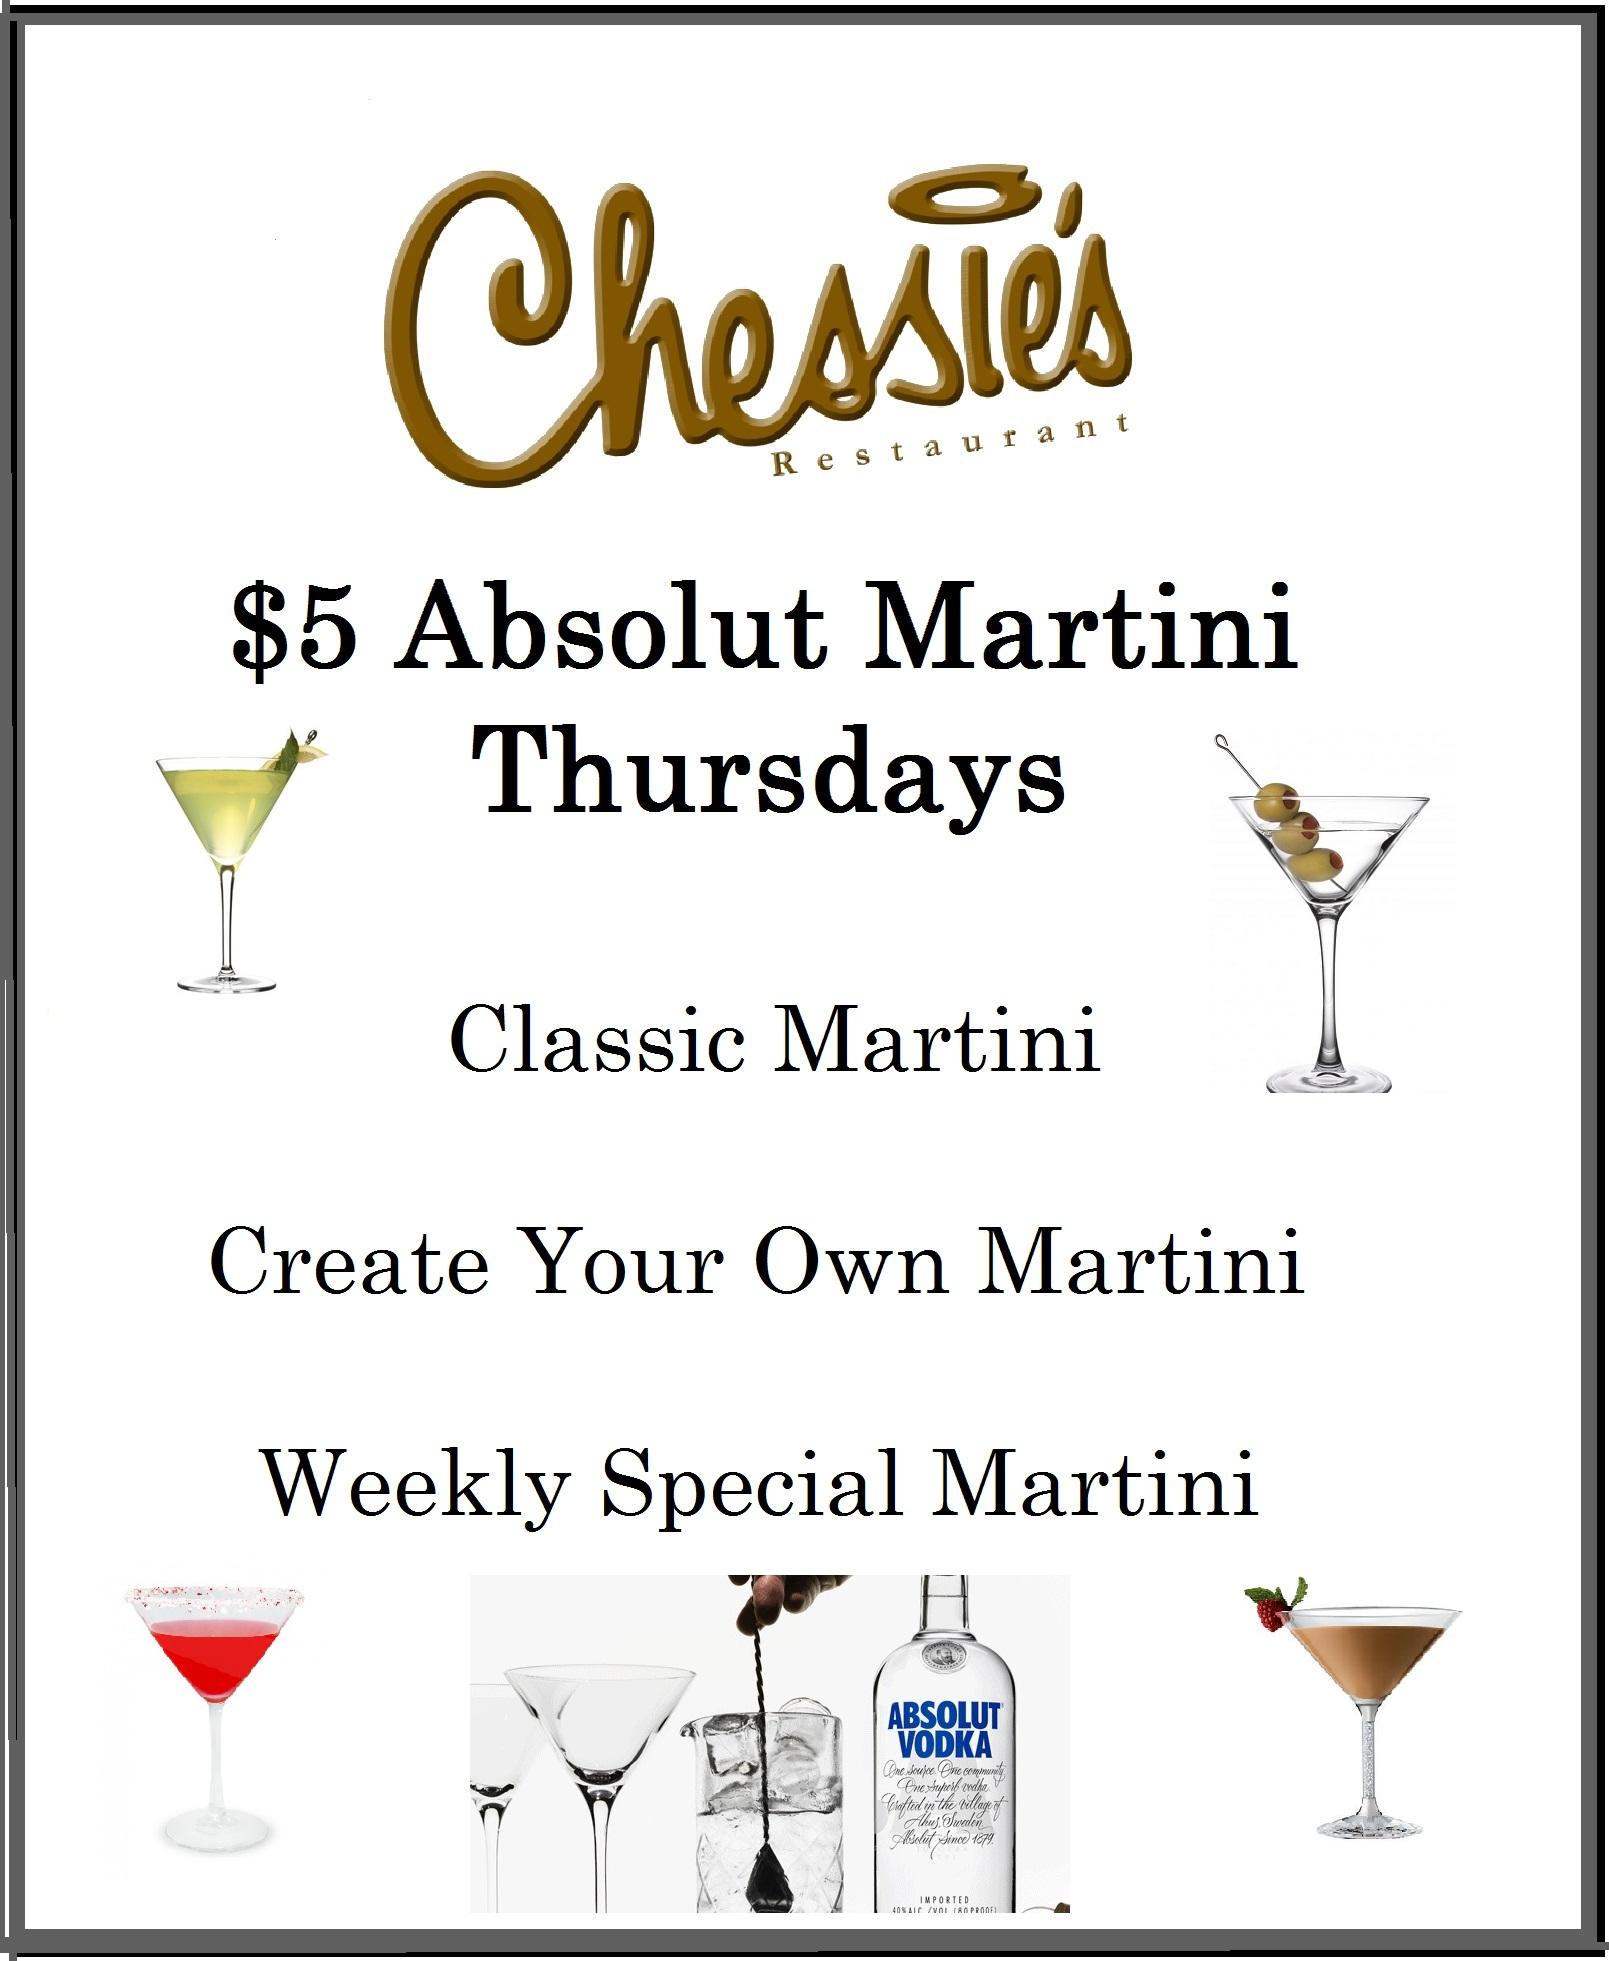 Chessie's $5 Martini Thursday